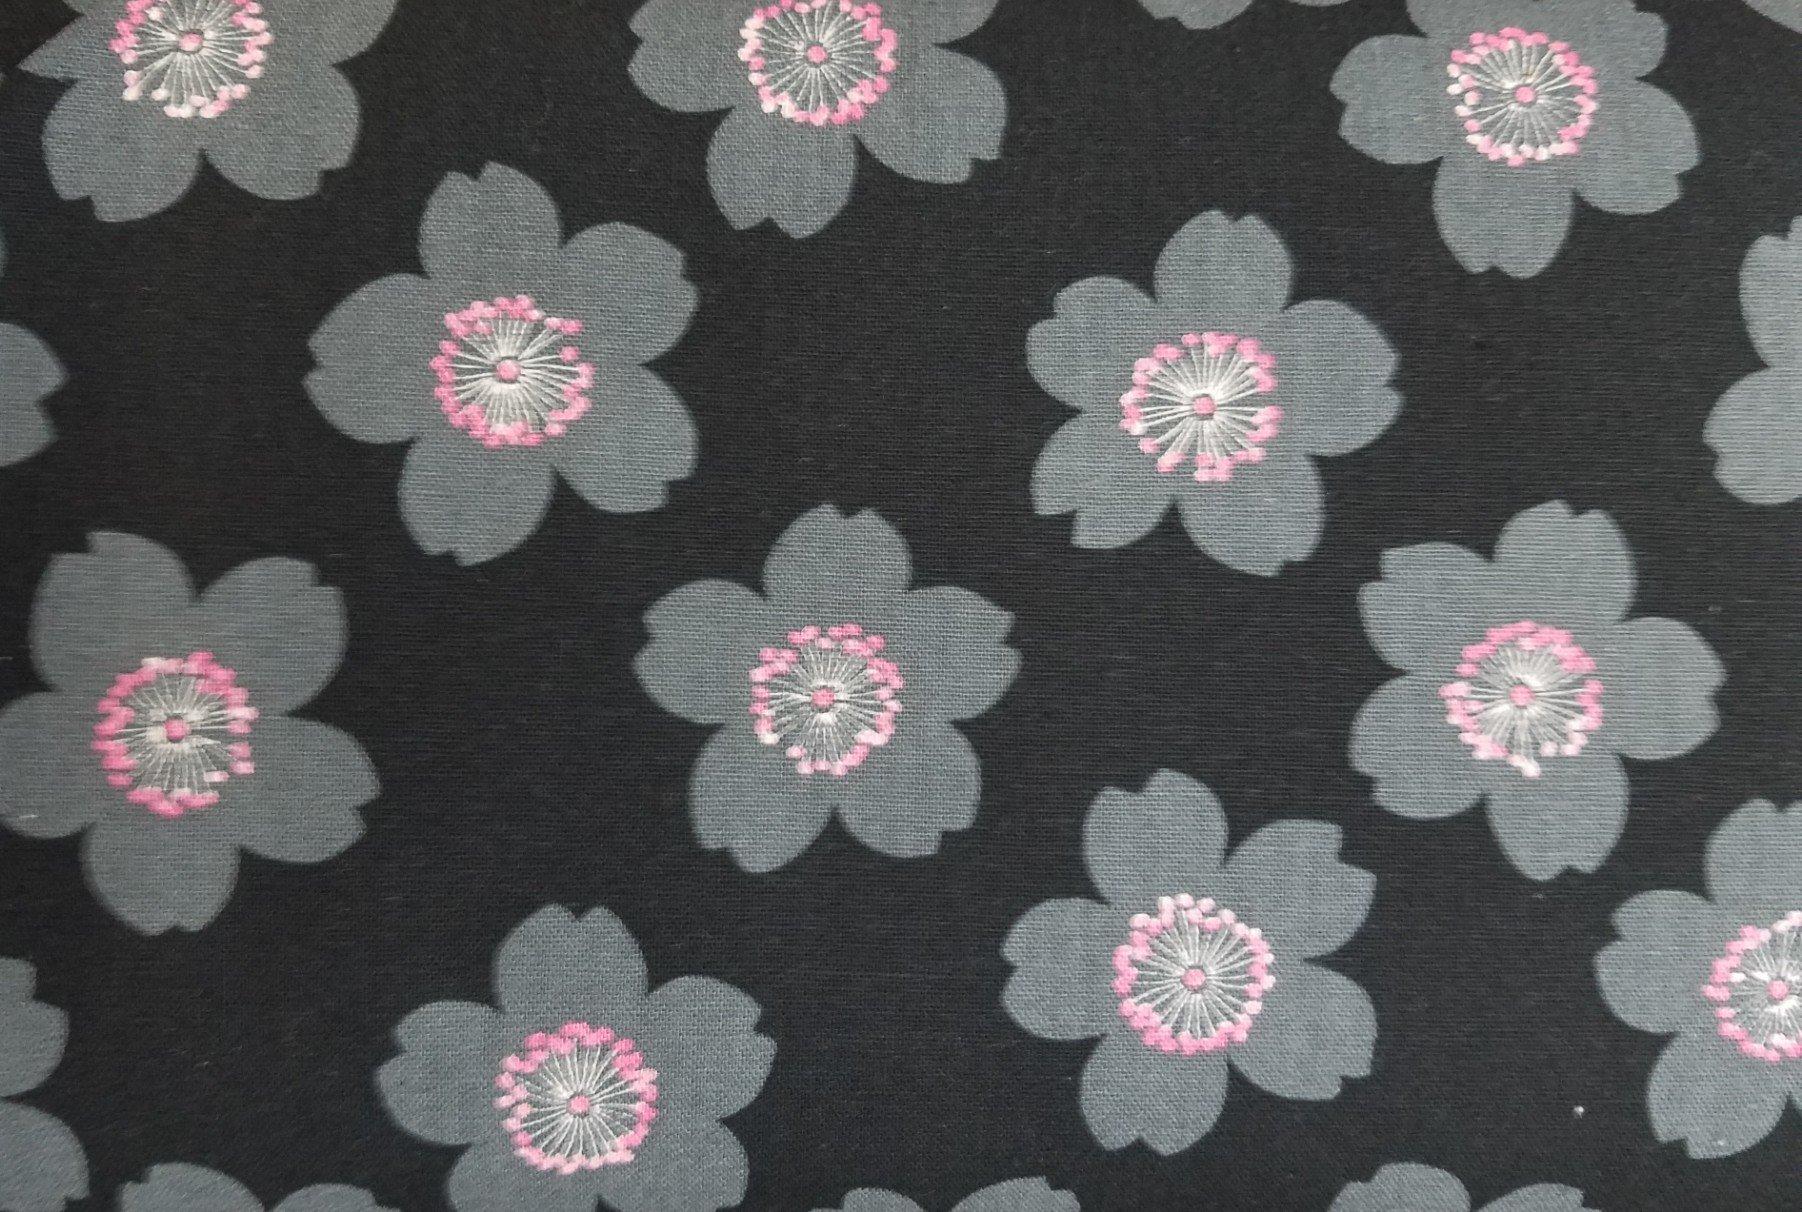 Cosmo Textiles Flowers on Black